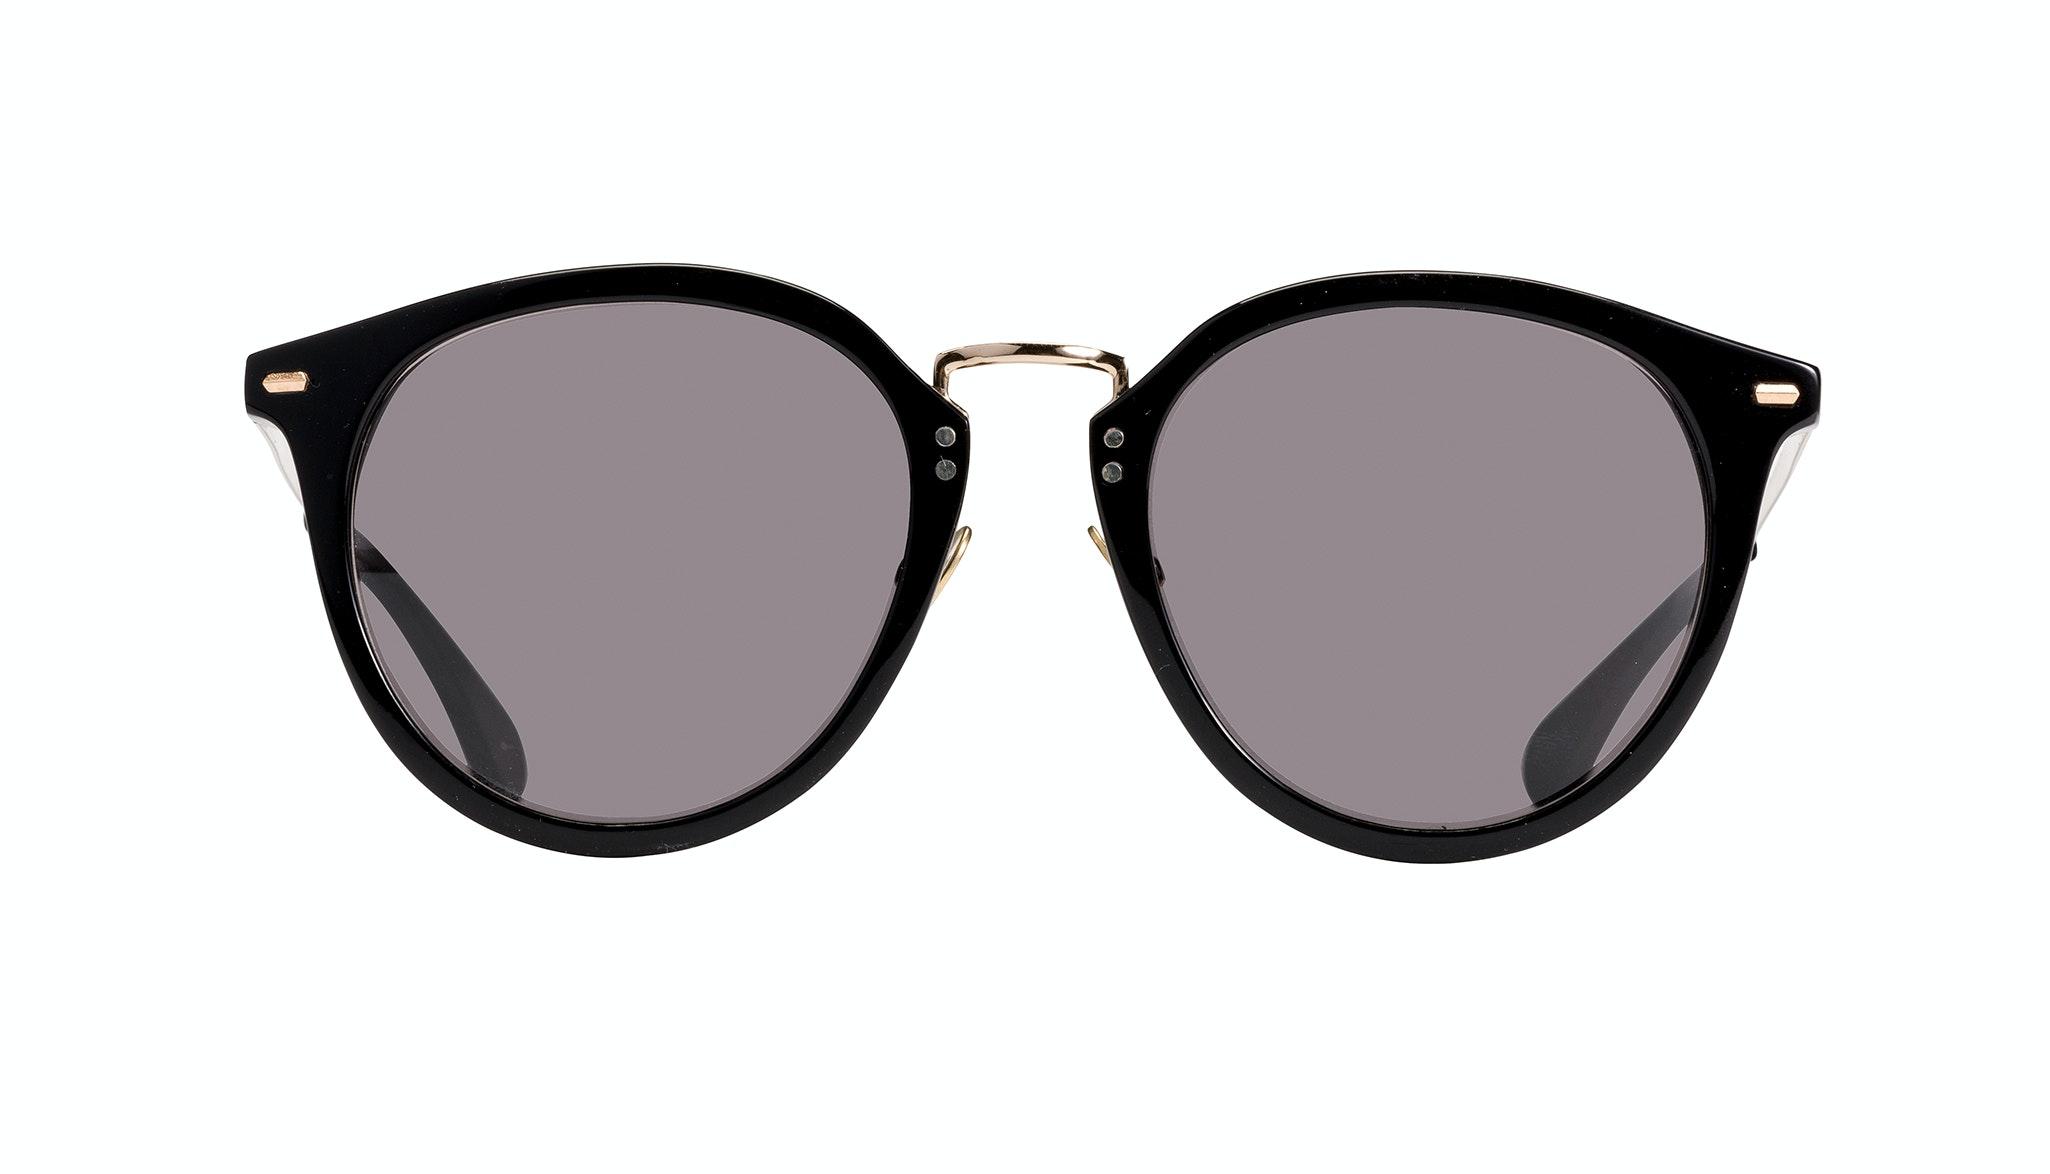 Affordable Fashion Glasses Round Sunglasses Women Poppy Ferris